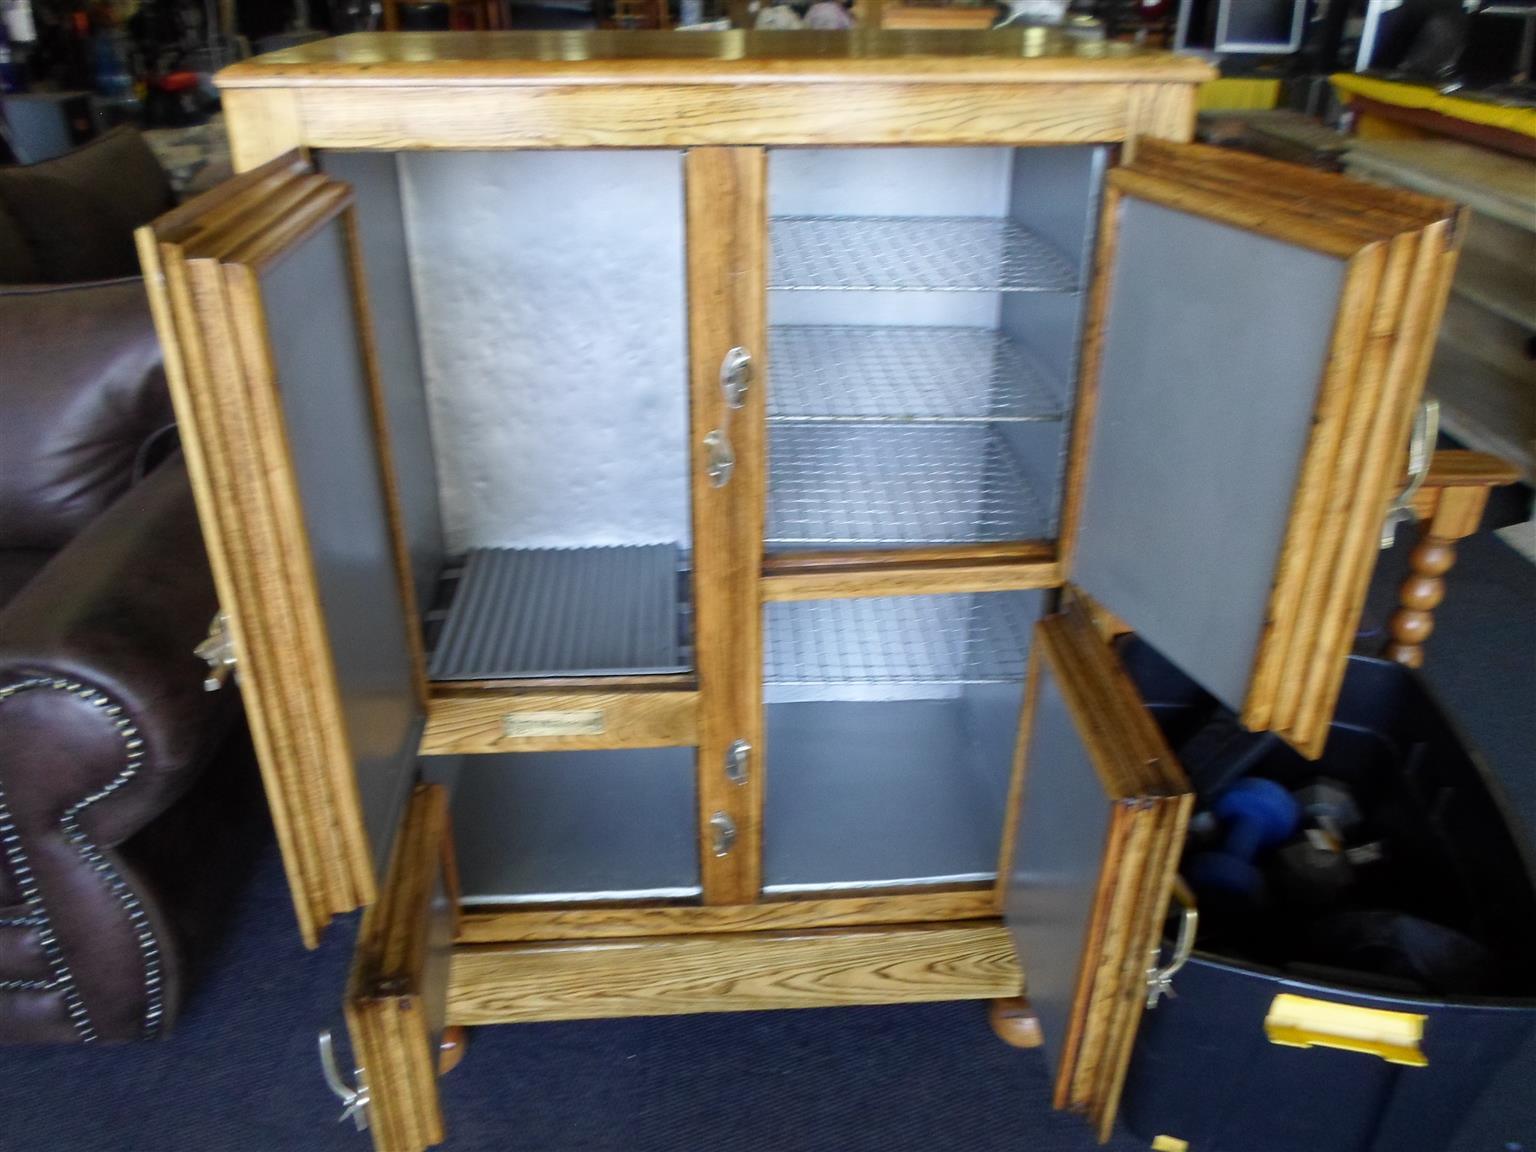 The Vermonter Wooden Antique Fridge / Freezer